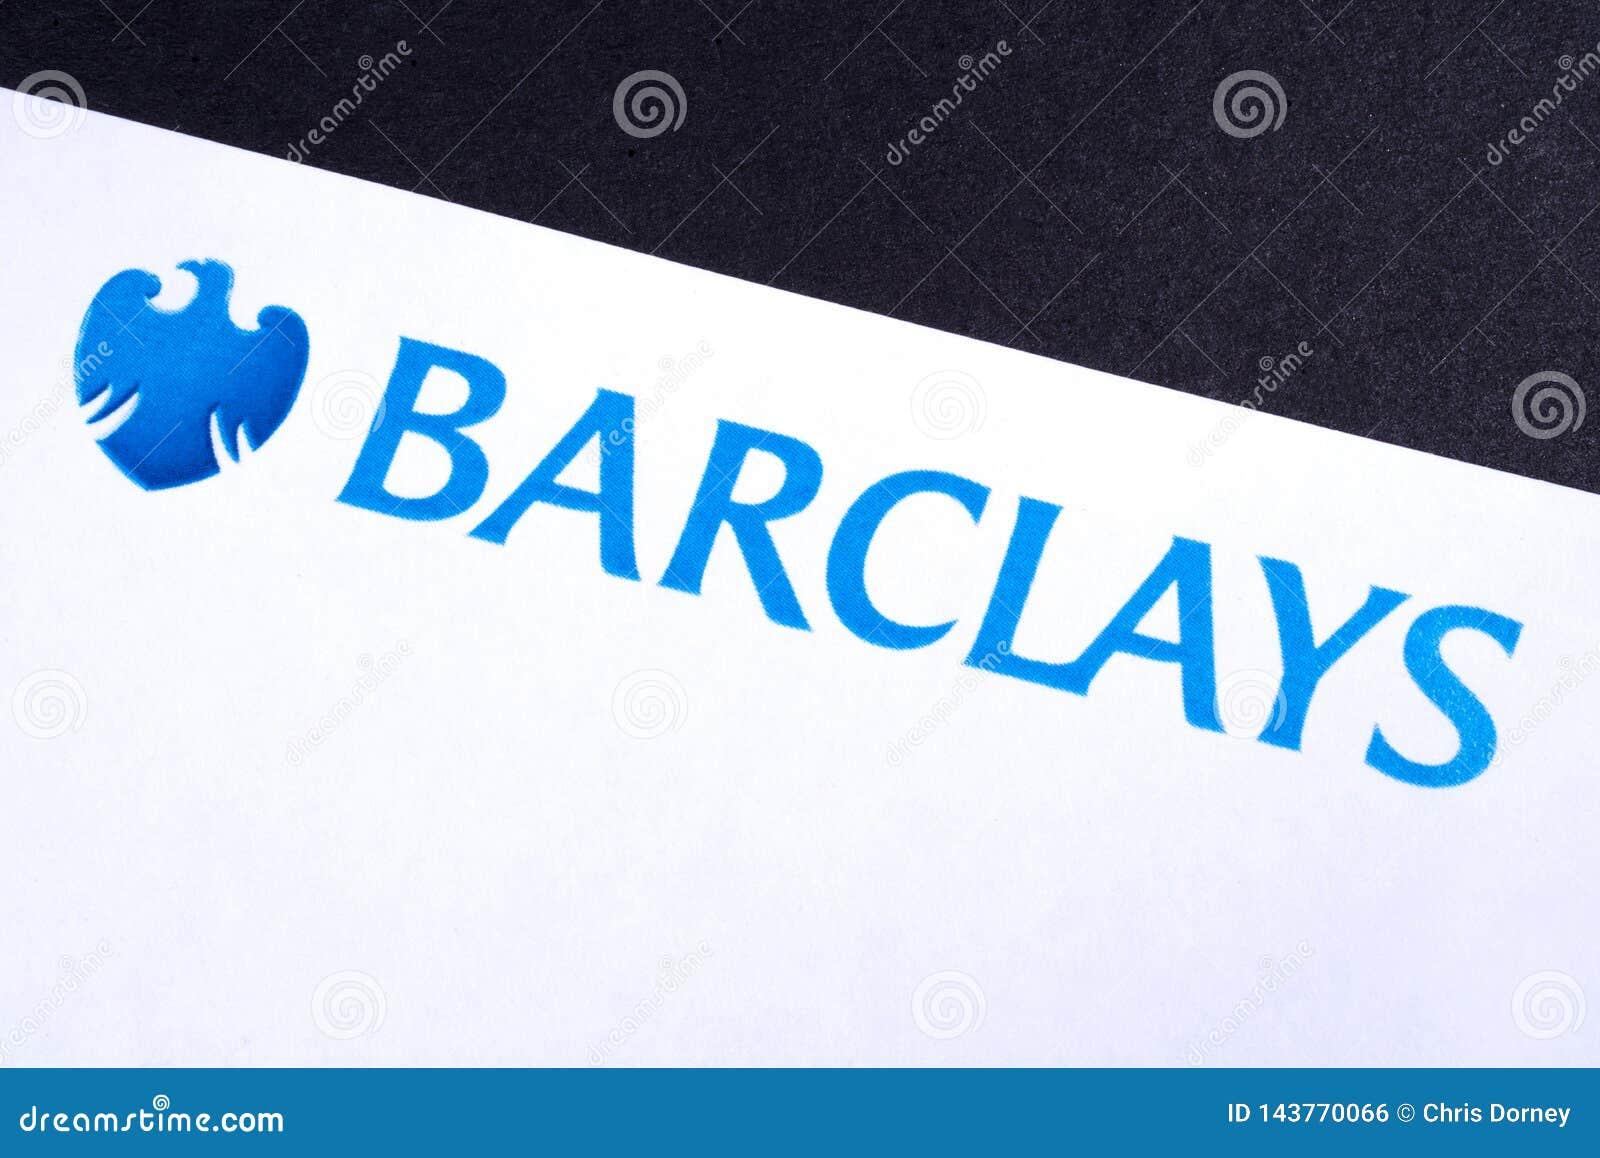 Barclays Bank Logo editorial photo  Image of cash, financial